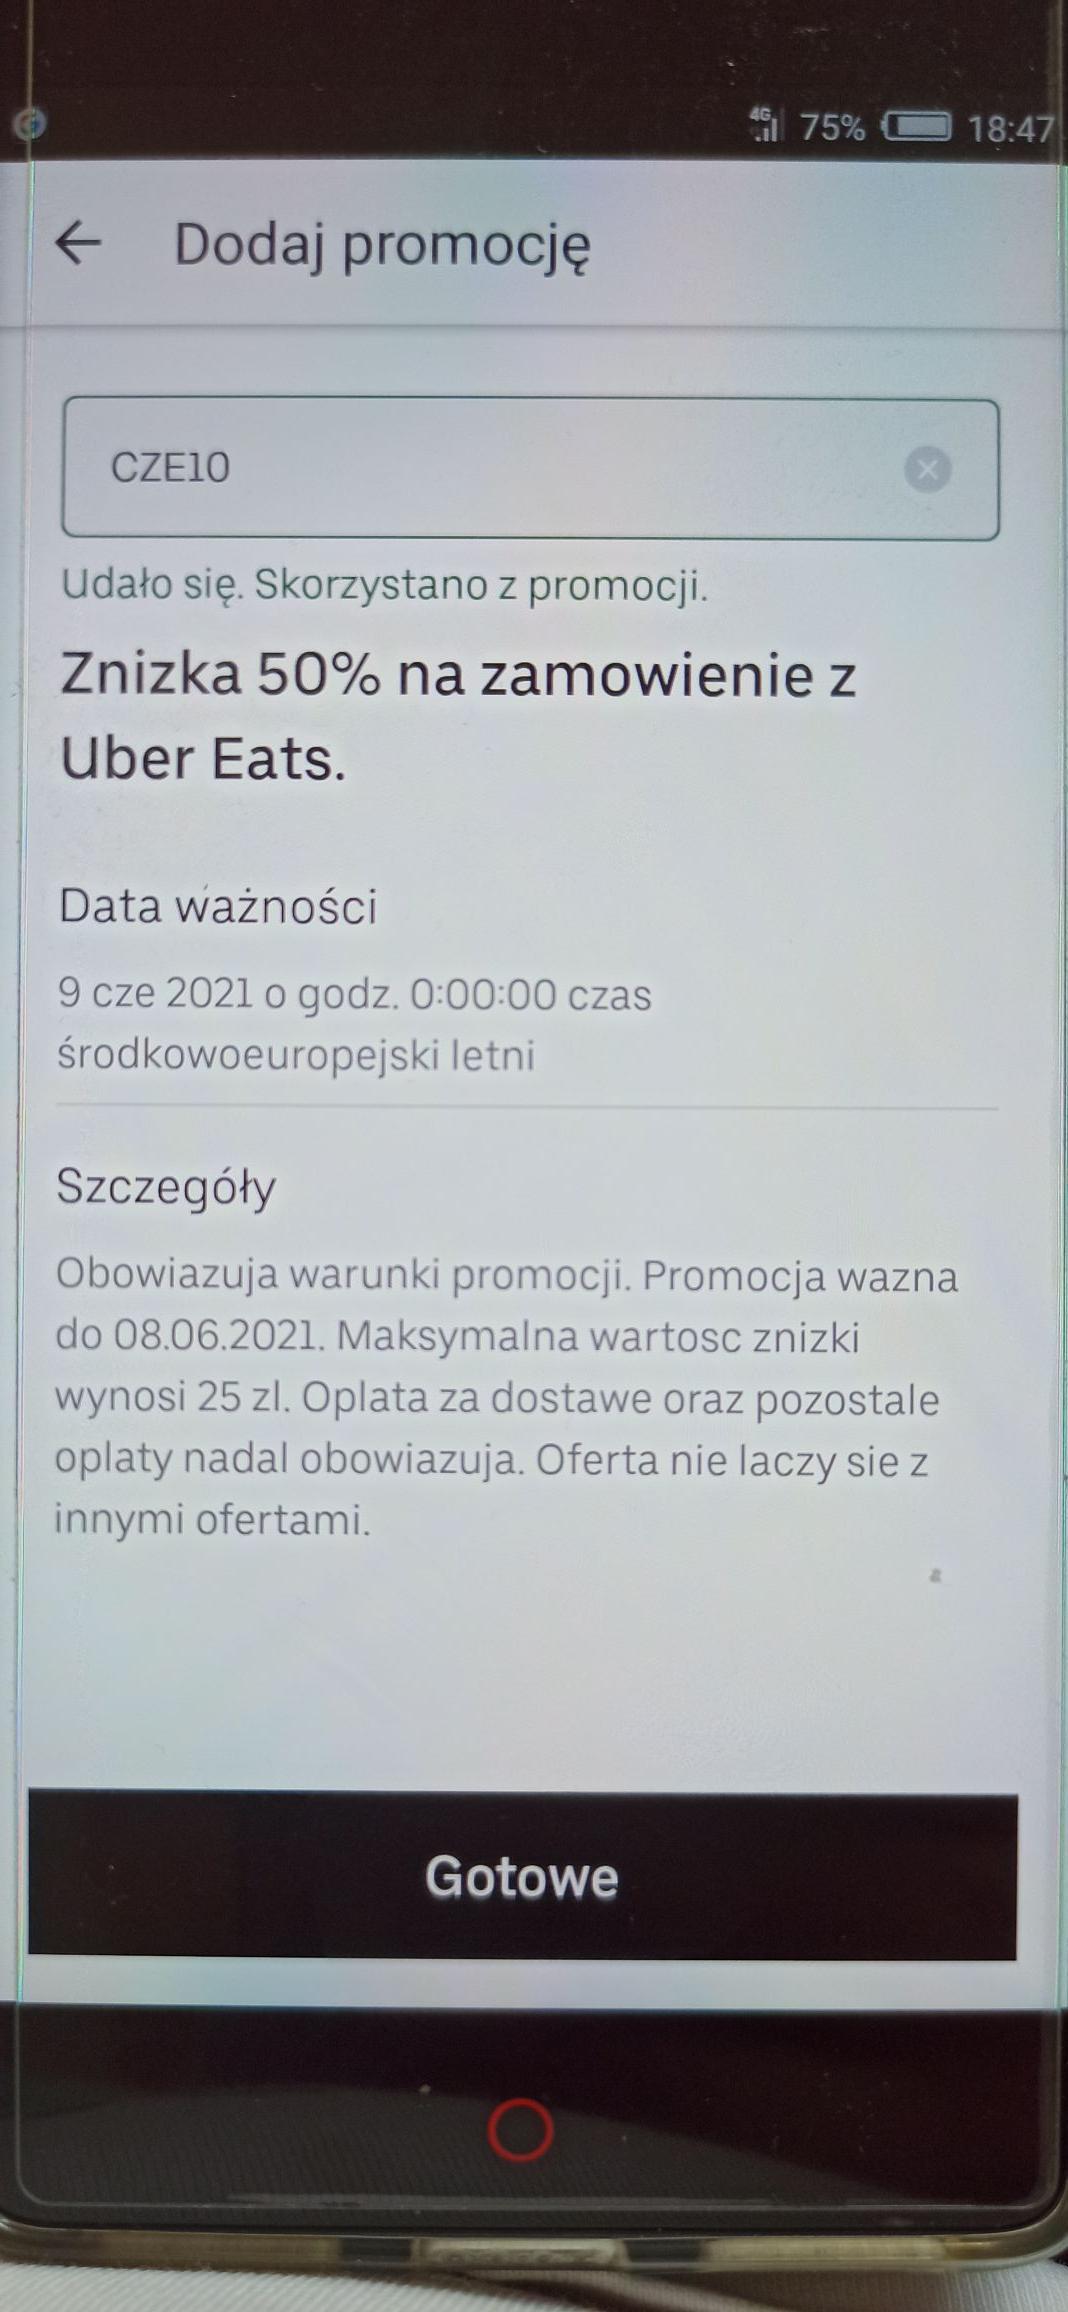 Zniżka 50% max 25 zł na Uber Eats